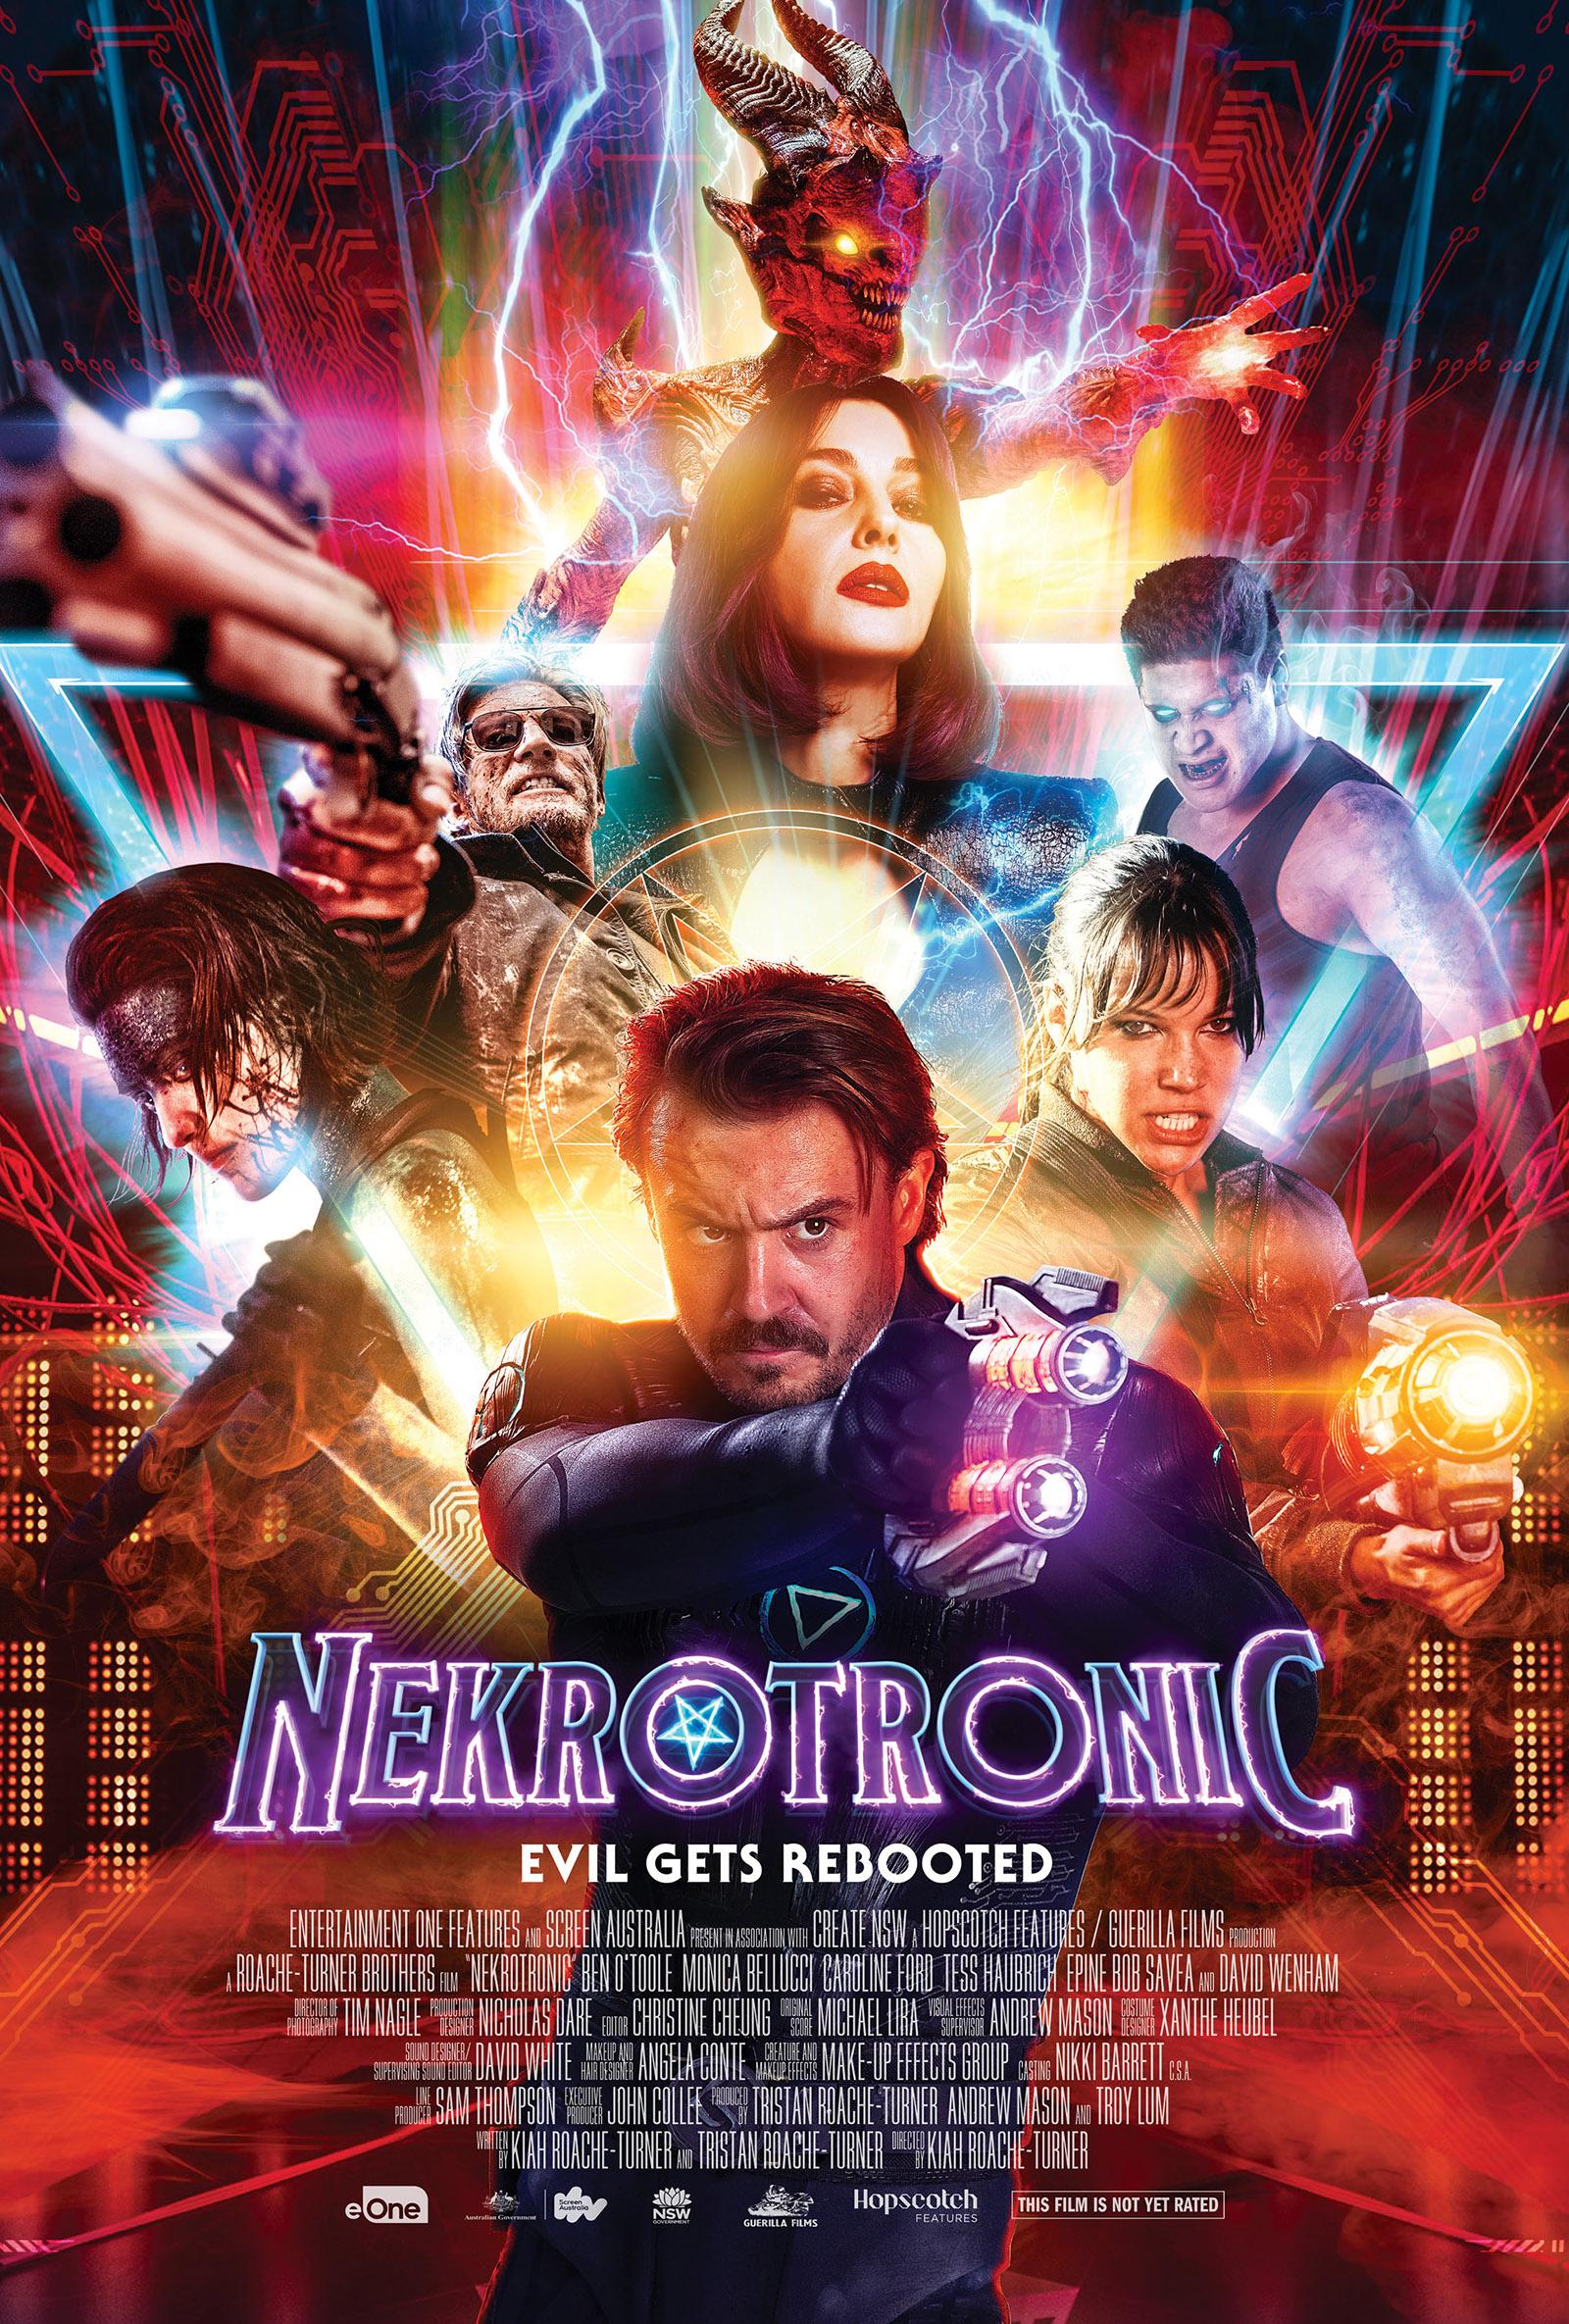 Nekrotronas (2018) / Nekrotronic (2018)